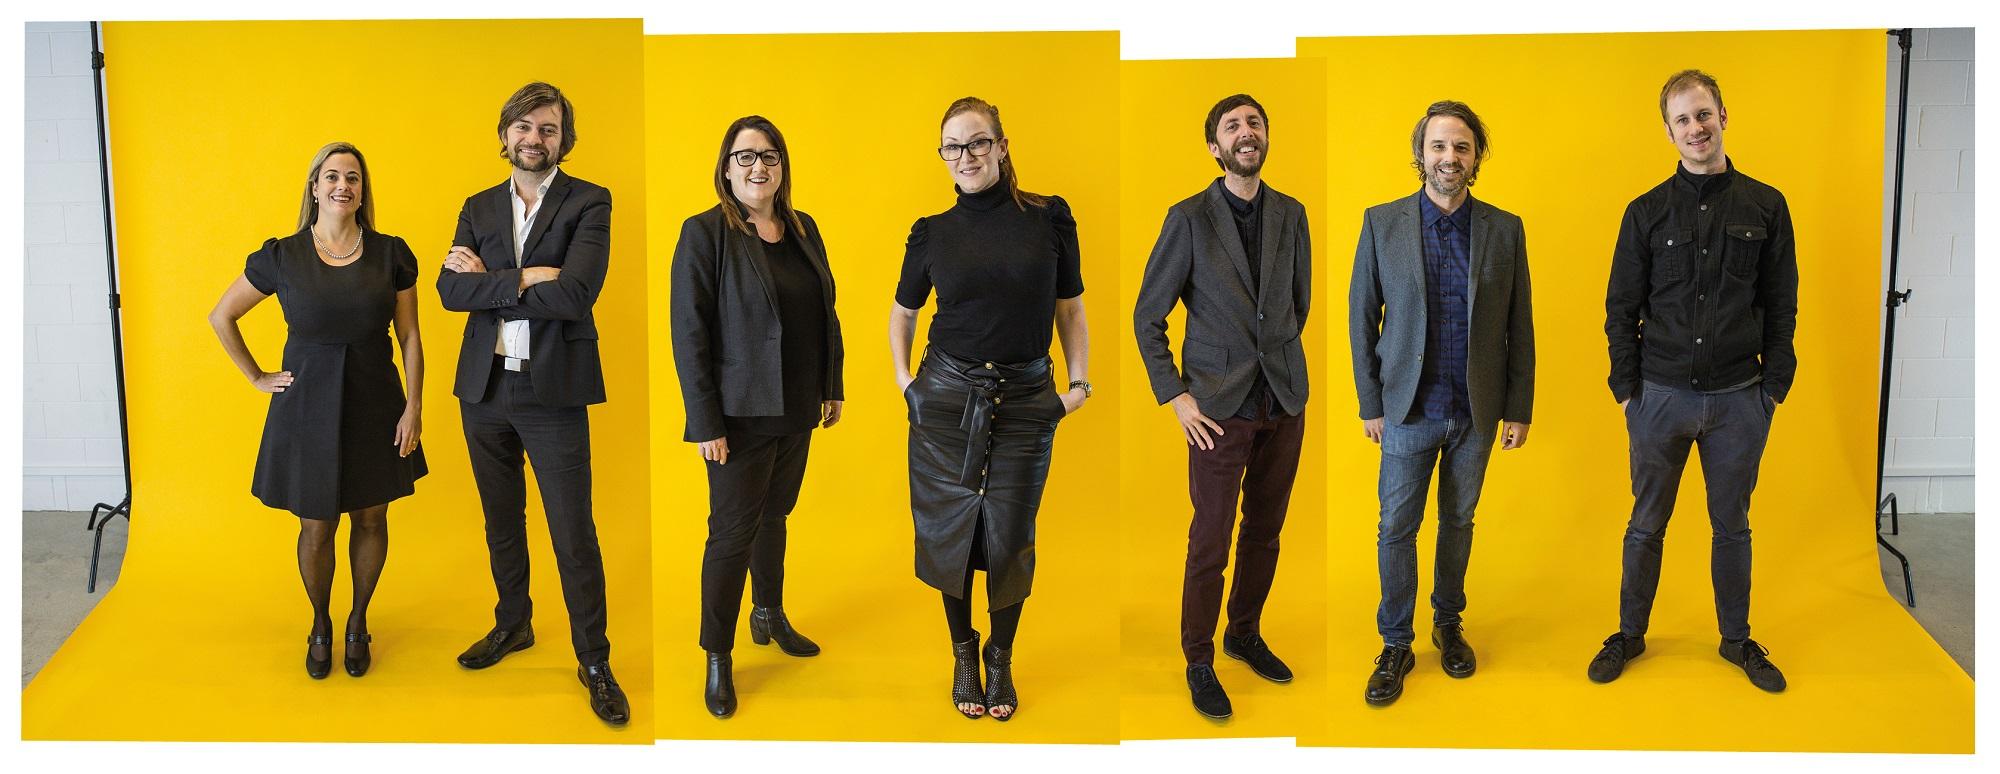 Khemistry's leadership team (Caroline Starecky, Andy Fyffe, Michelle Tungate, Priscilla Jeha, James Bracken, Lindsay Thompson, Phil Hagstrom)